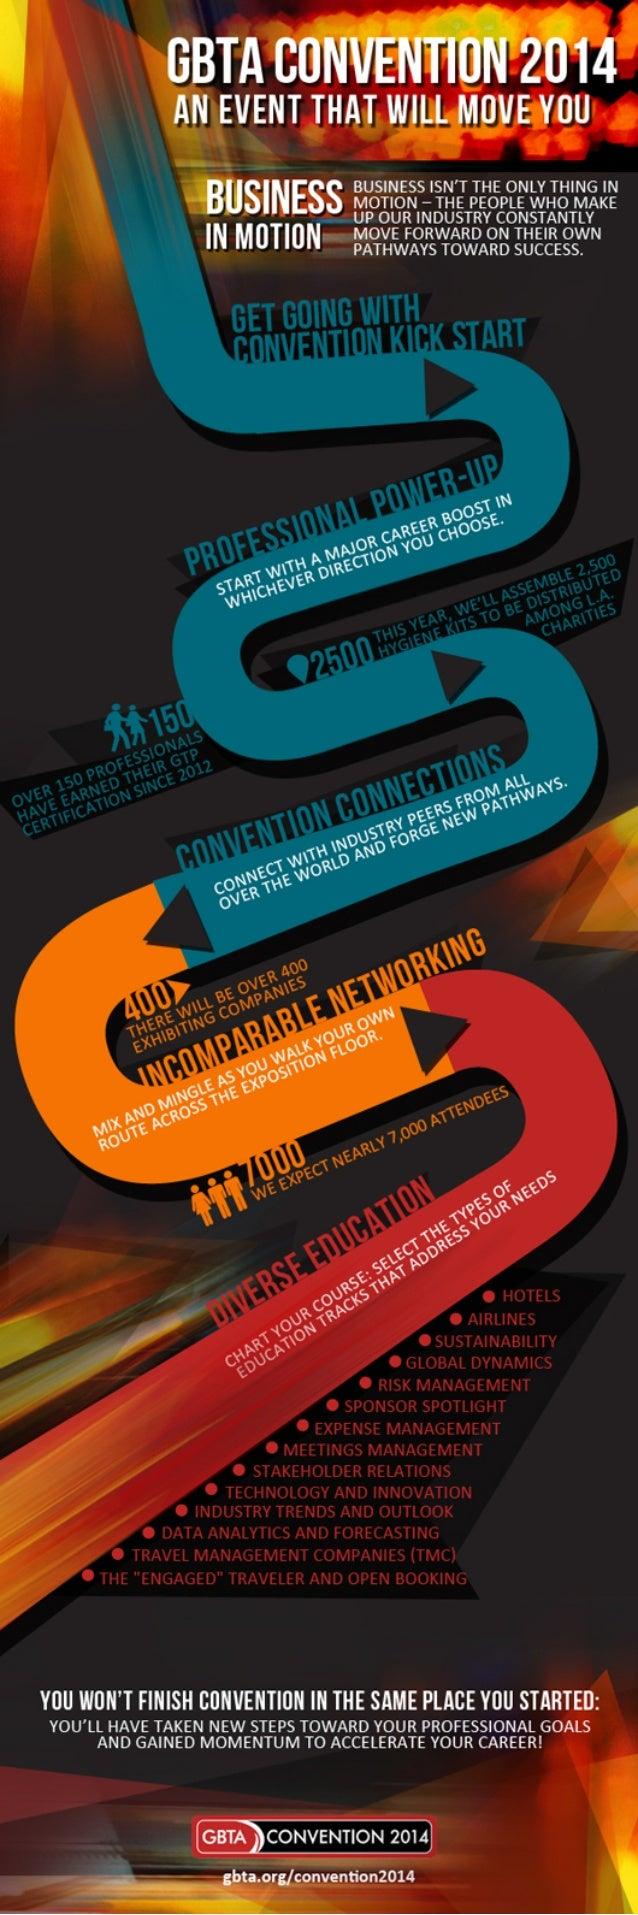 GBTA Convention 2014 Infographic